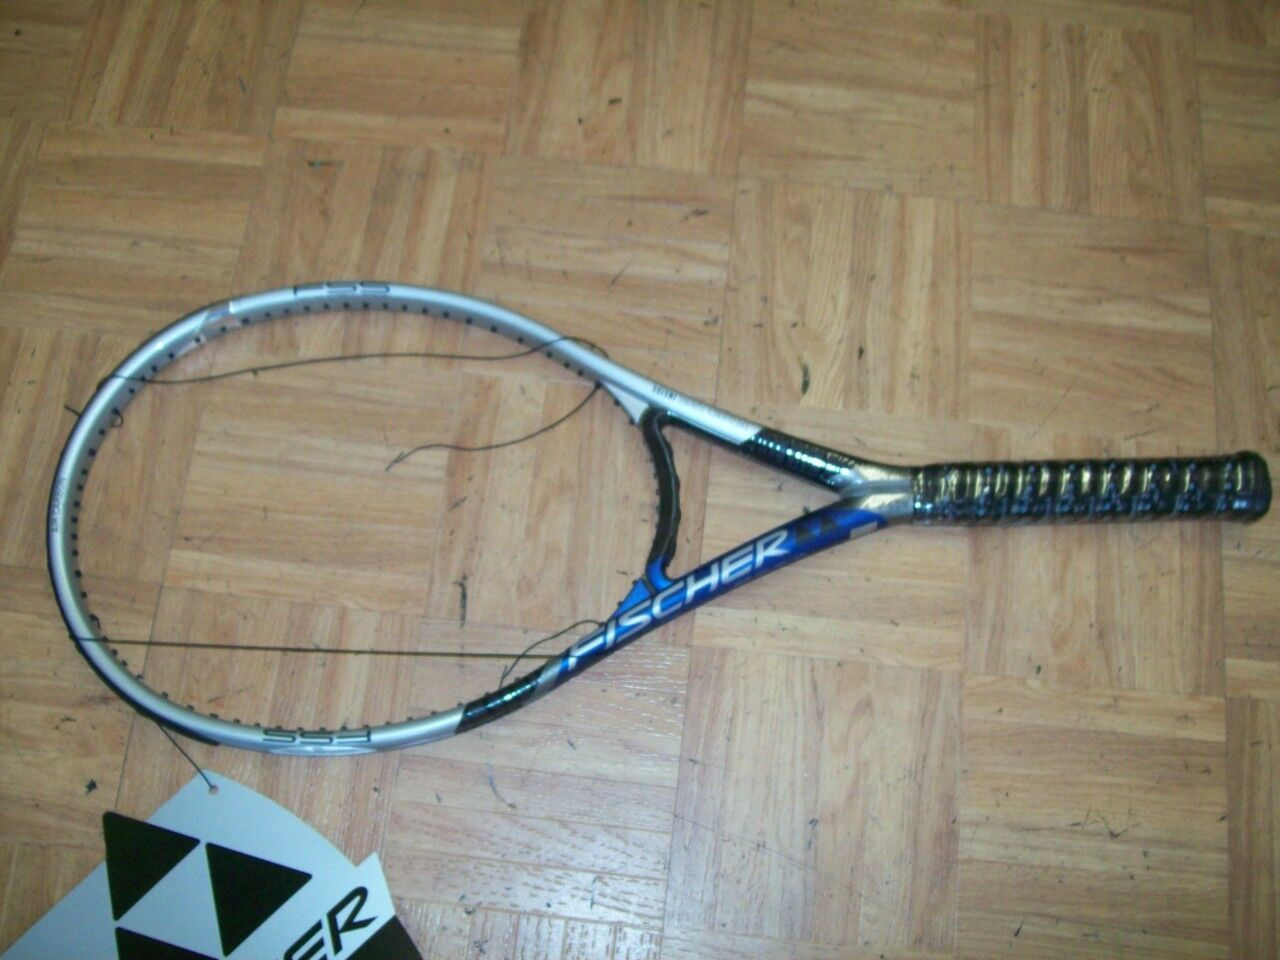 Nuevo Fischer doble Tech 750  Aire Cochebono 105 4 3 8 tenis raqueta  comprar nuevo barato